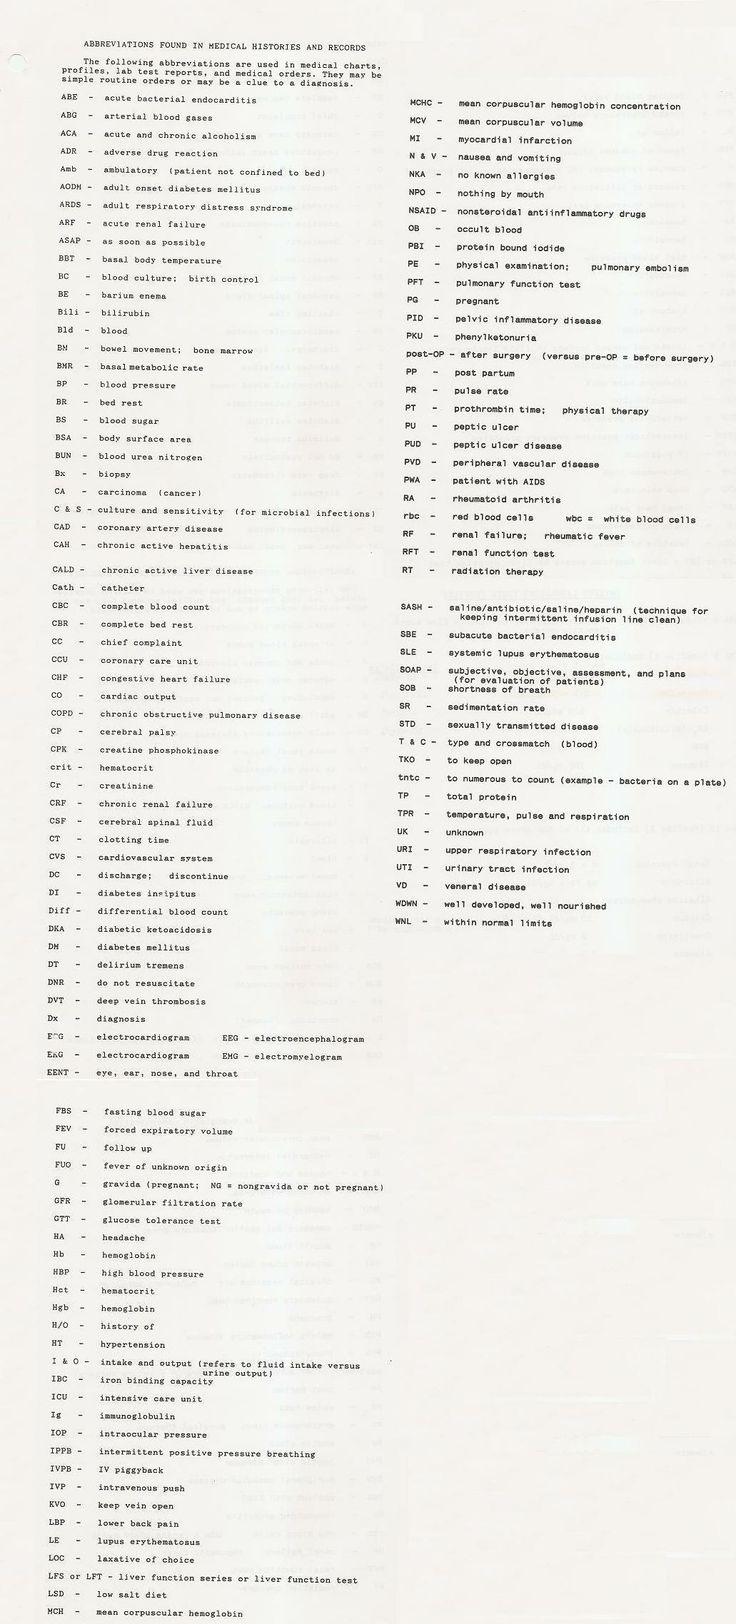 Medical abbreviations tha - Medical Abbreviations And Symbols Disease State Treatment Guidelines Medical Drug Information